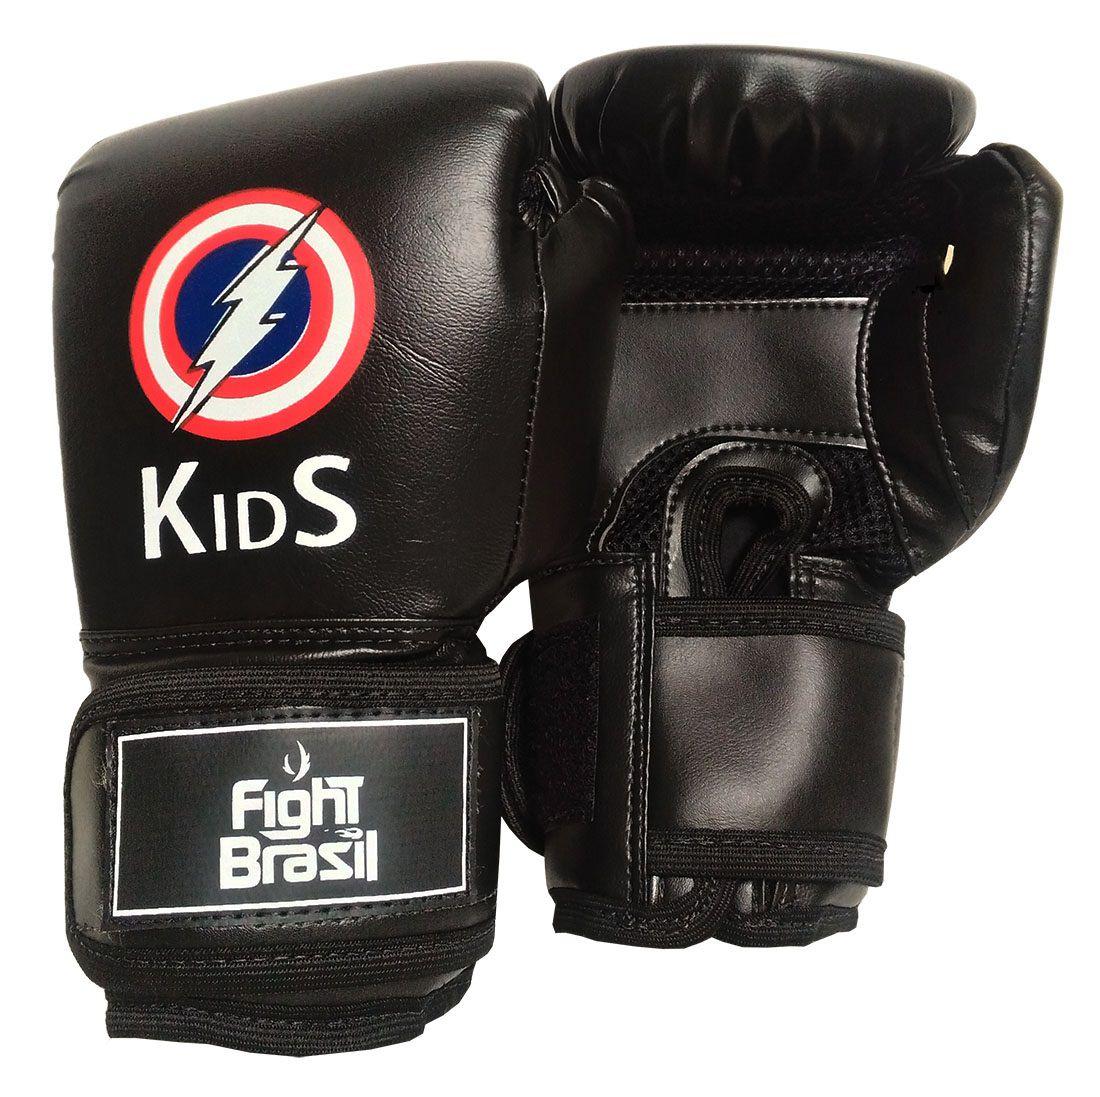 cc46ec243 Luva Muay Thai Boxe Infantil 4 Oz Kids Crianças Fight Brasil